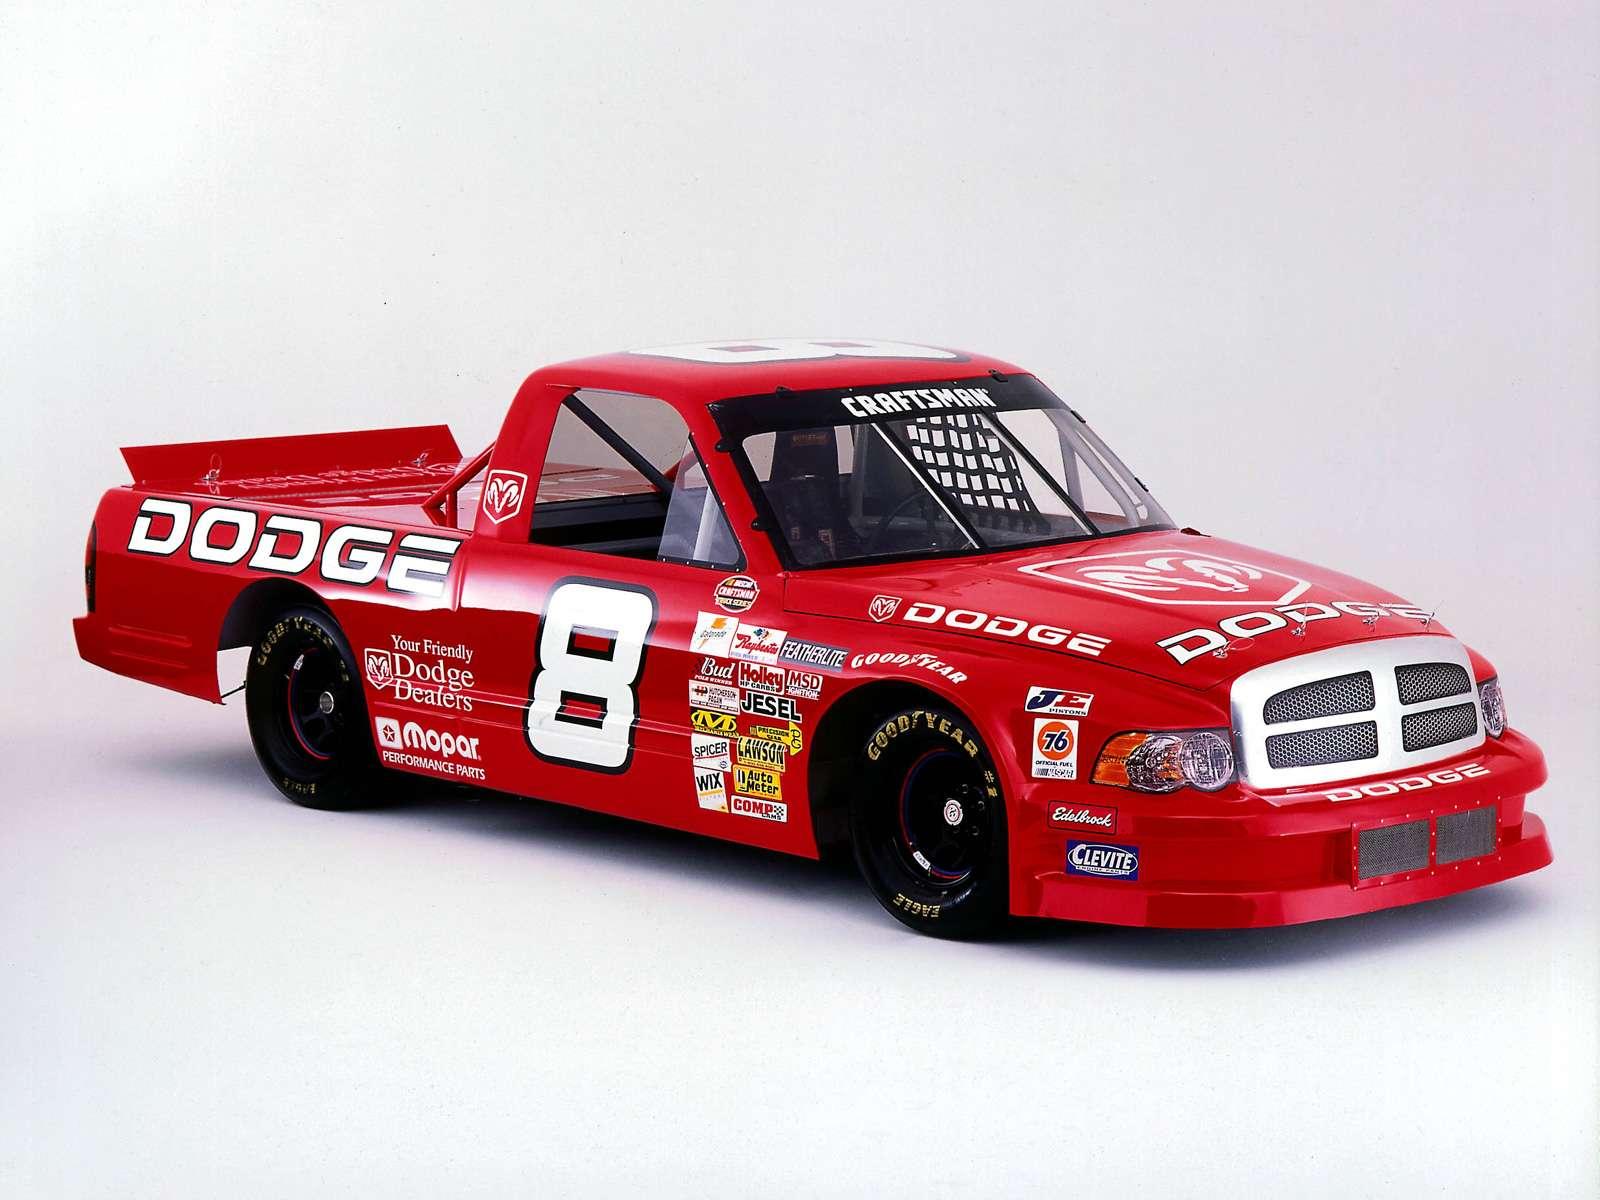 Dodge Ram NASCAR Craftsman Truck Series 2002 wallpaper